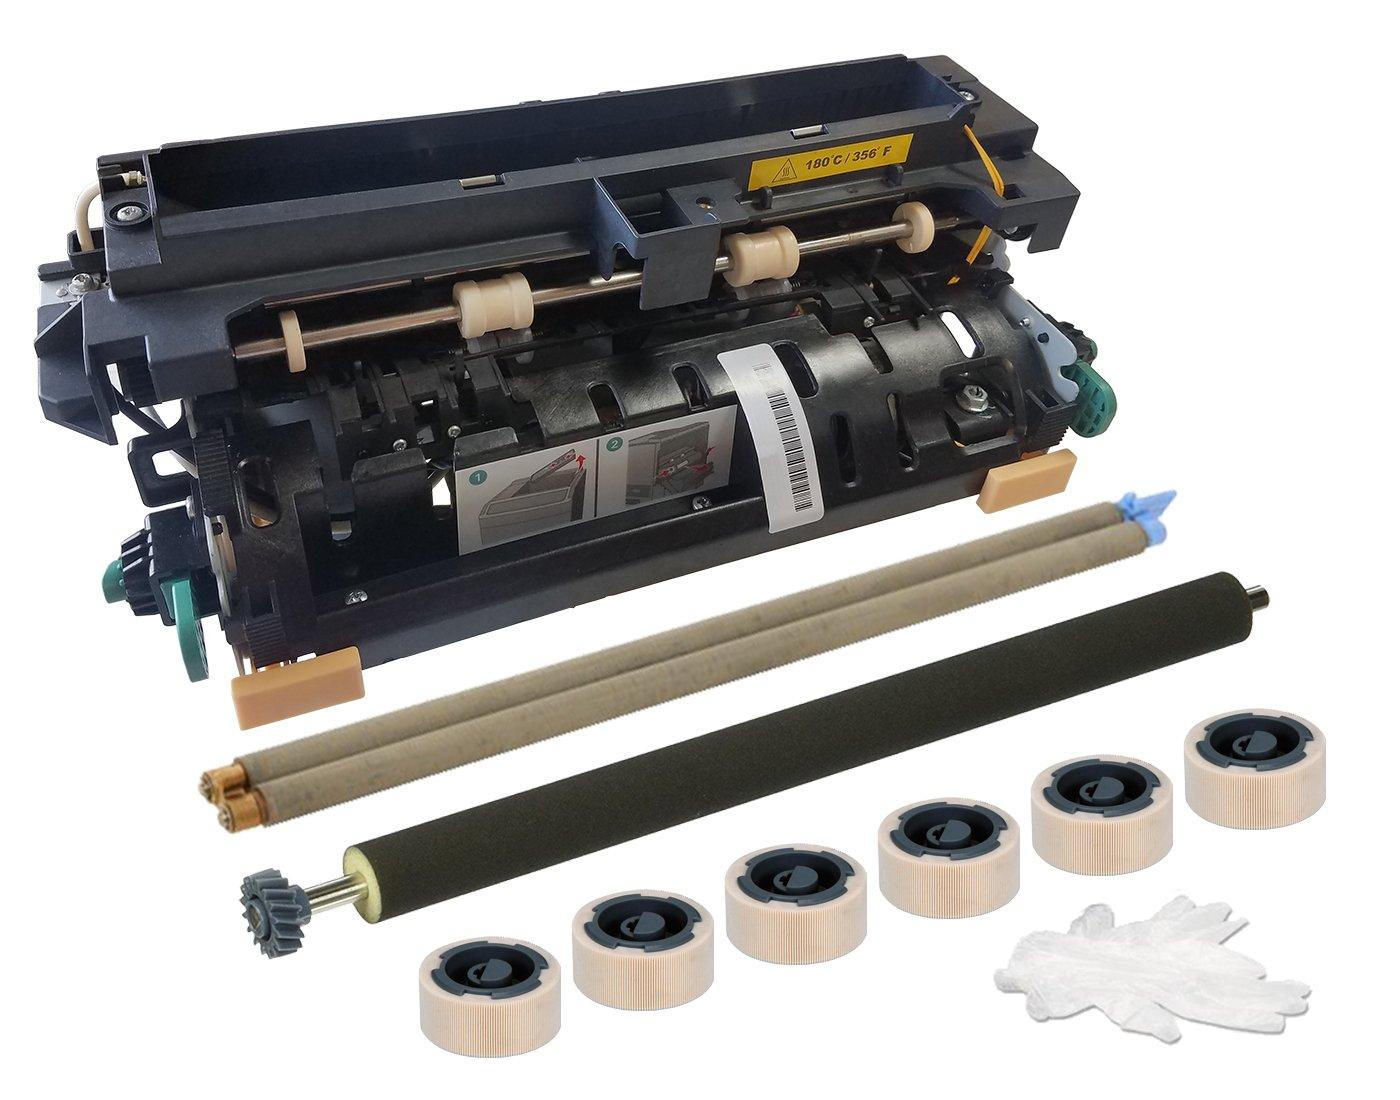 Altru Print 40X4724-AP Maintenance Kit for Lexmark T650 / T652 / T654 / T656 / X652 / X654 / X656 / X658 (110V) Also for InfoPrint 39V3590 and Dell 330-9784 by Altru Print